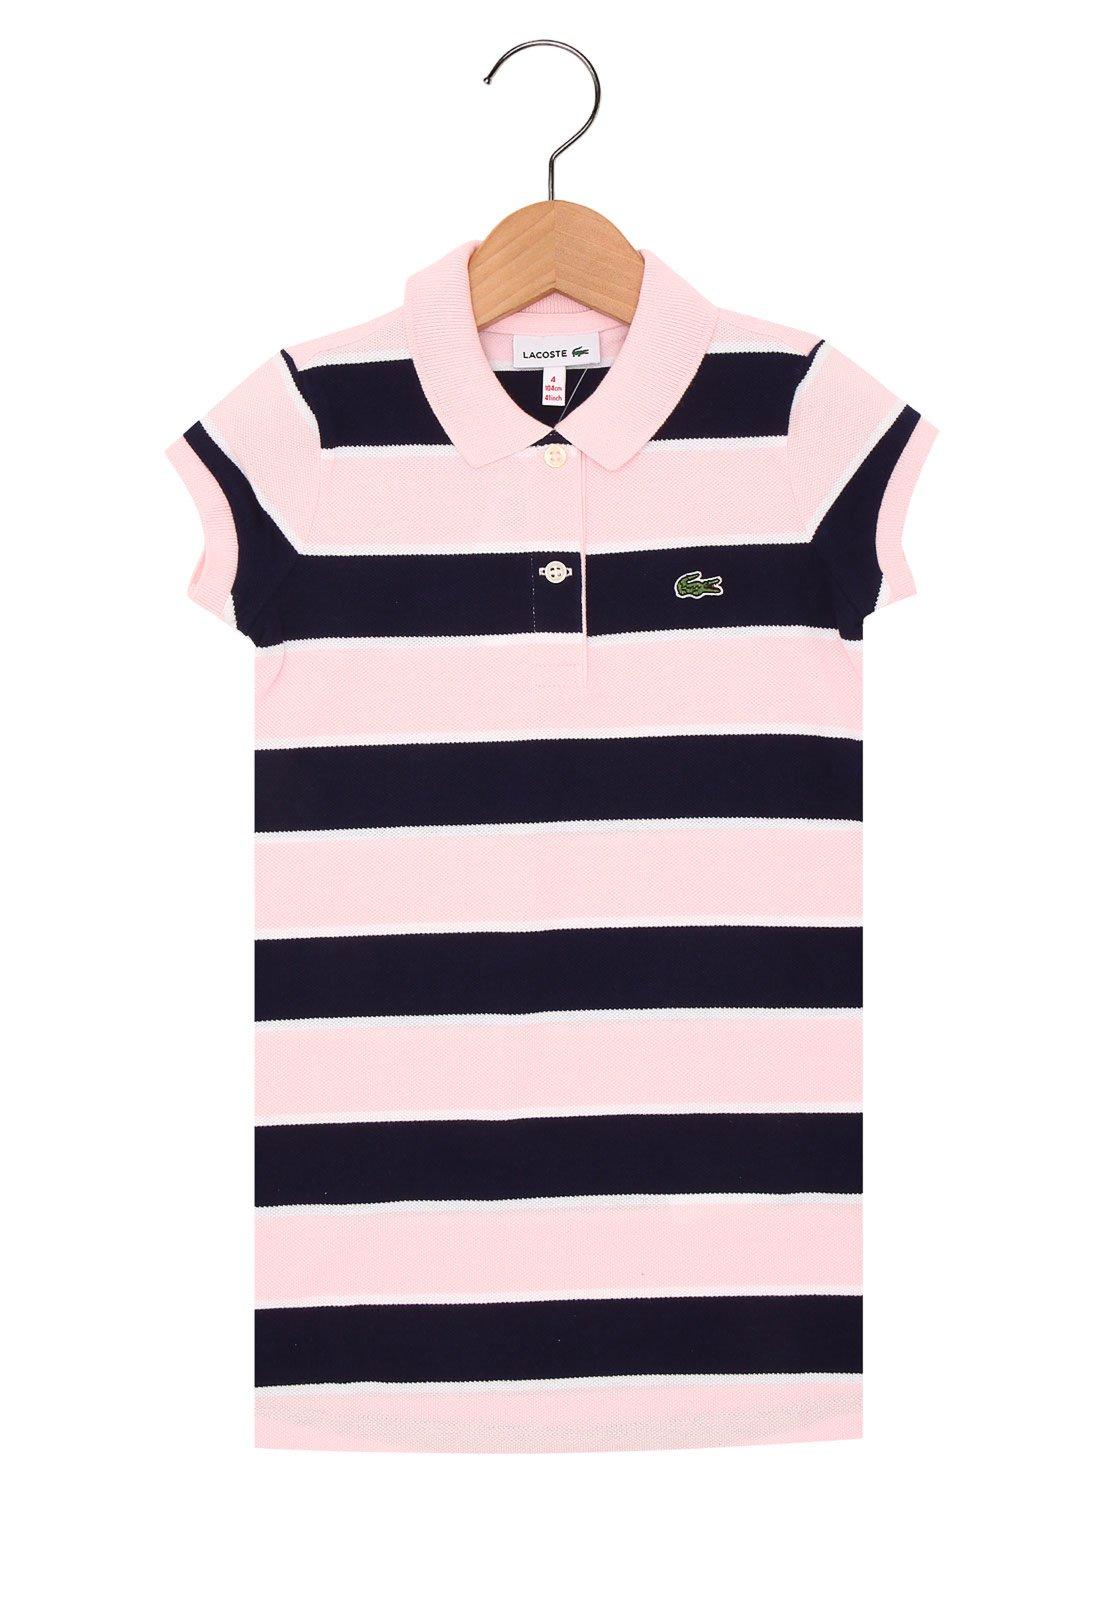 53244fc55c Vestido Lacoste Menina Rosa - Compre Agora